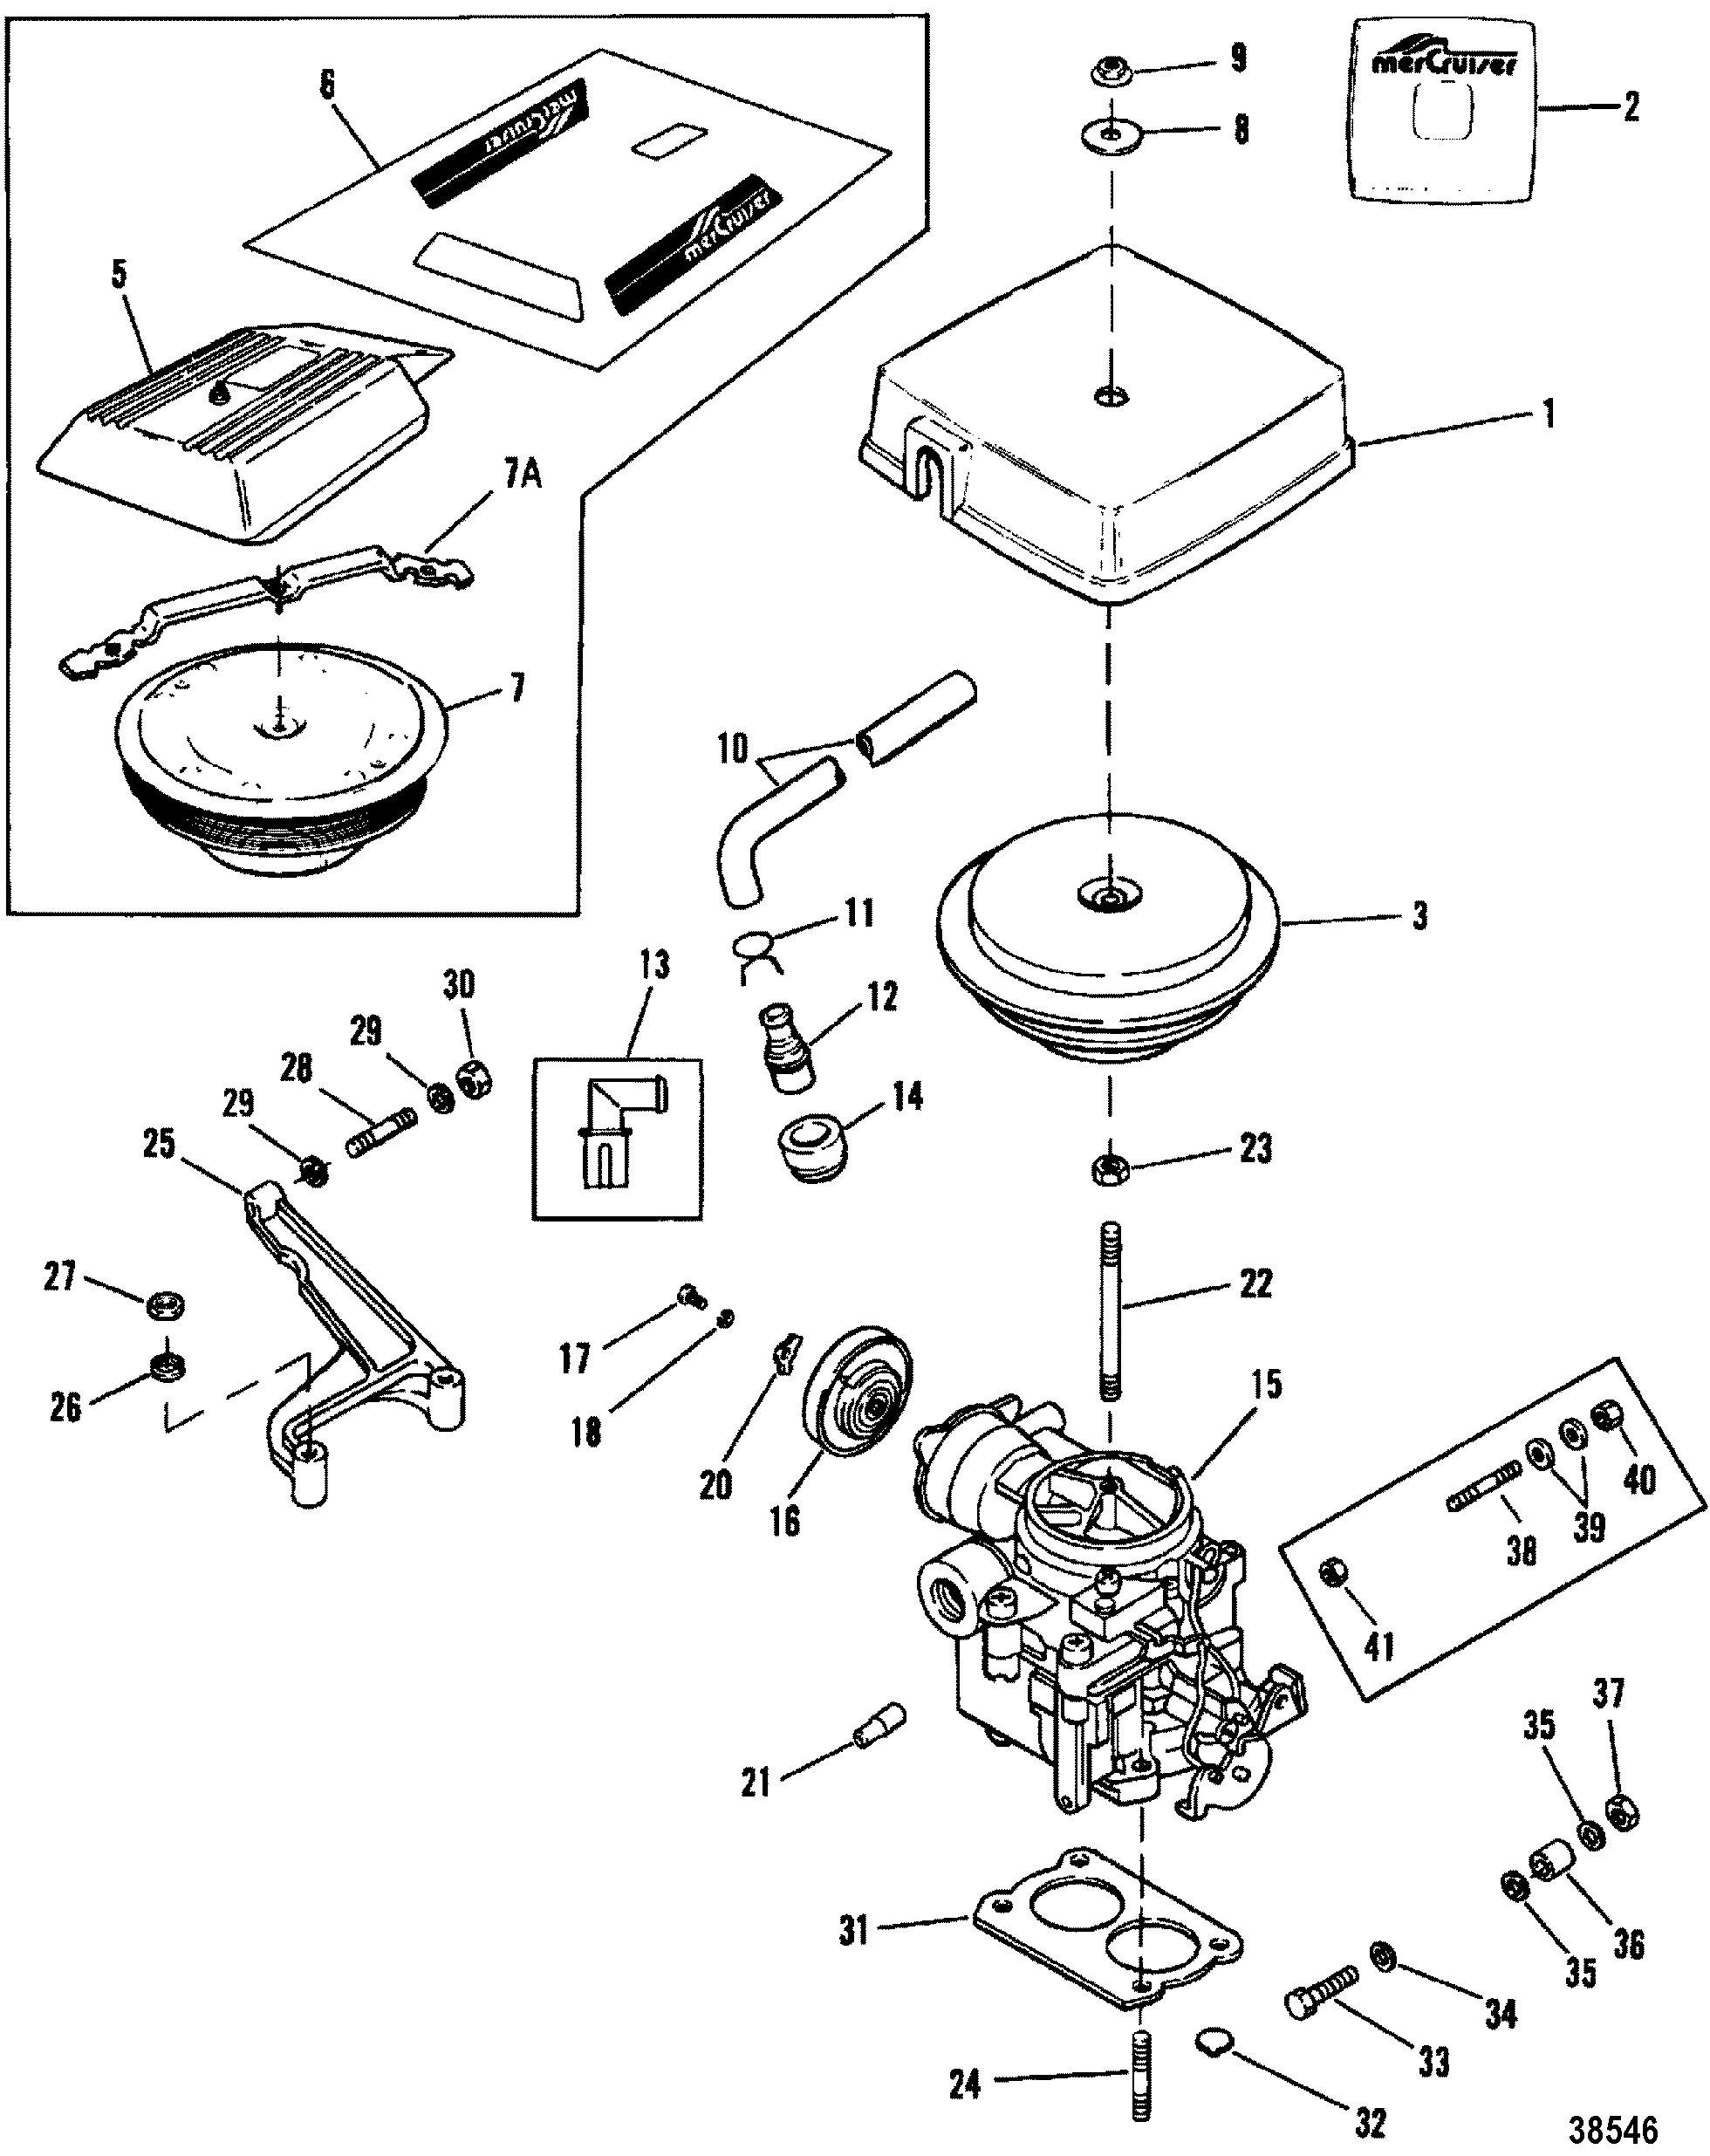 hight resolution of 350 mercruiser engine diagram carburetor throttle linkage 2 barrel for mercruiser 200 5 0l lx 260